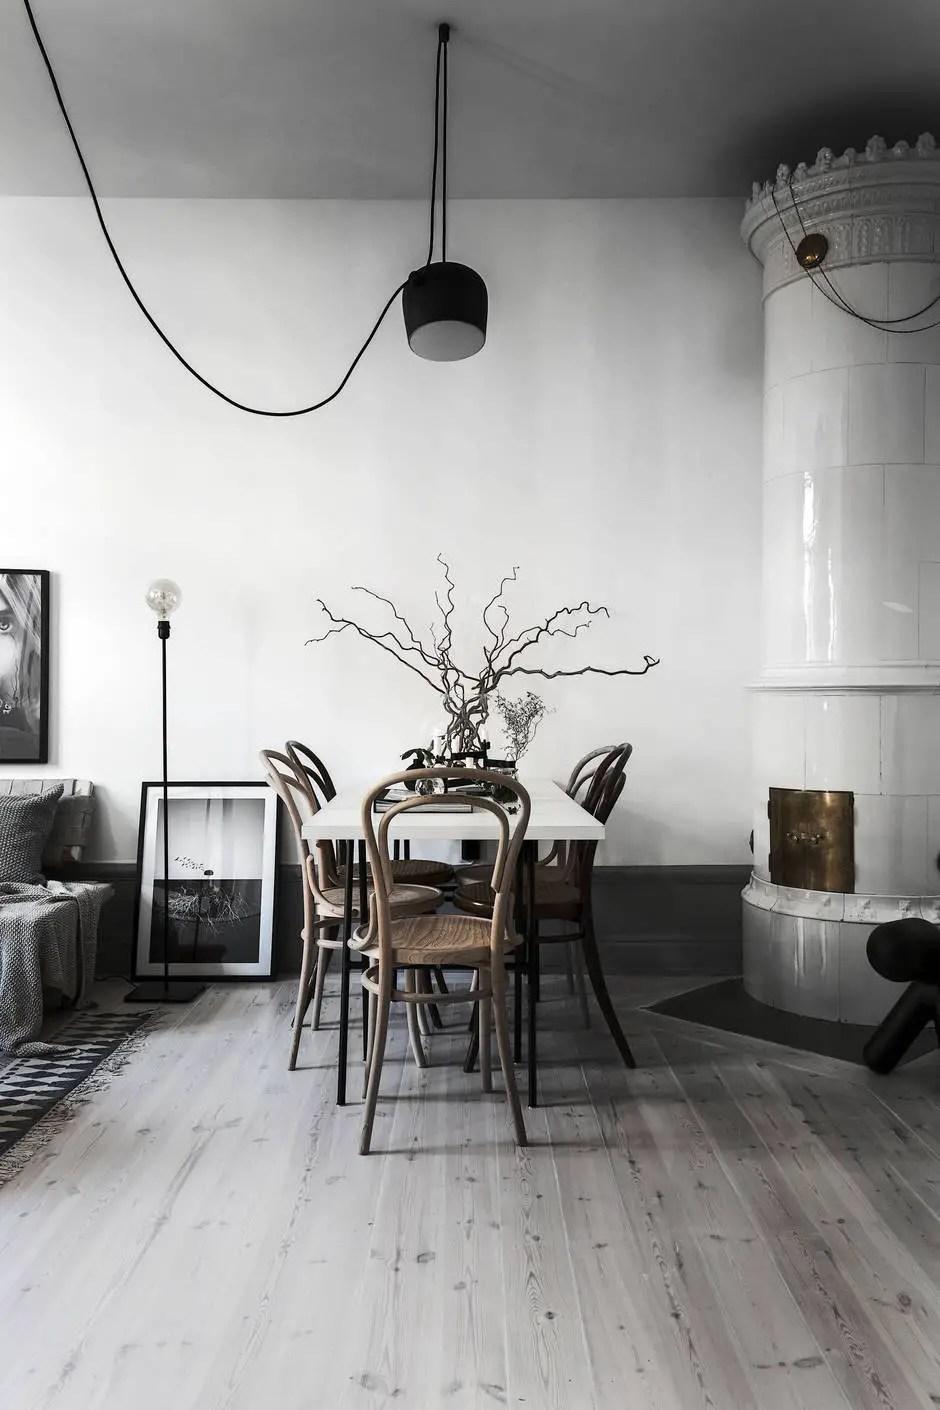 petite surface archives page 53 sur 141 planete deco a homes world. Black Bedroom Furniture Sets. Home Design Ideas